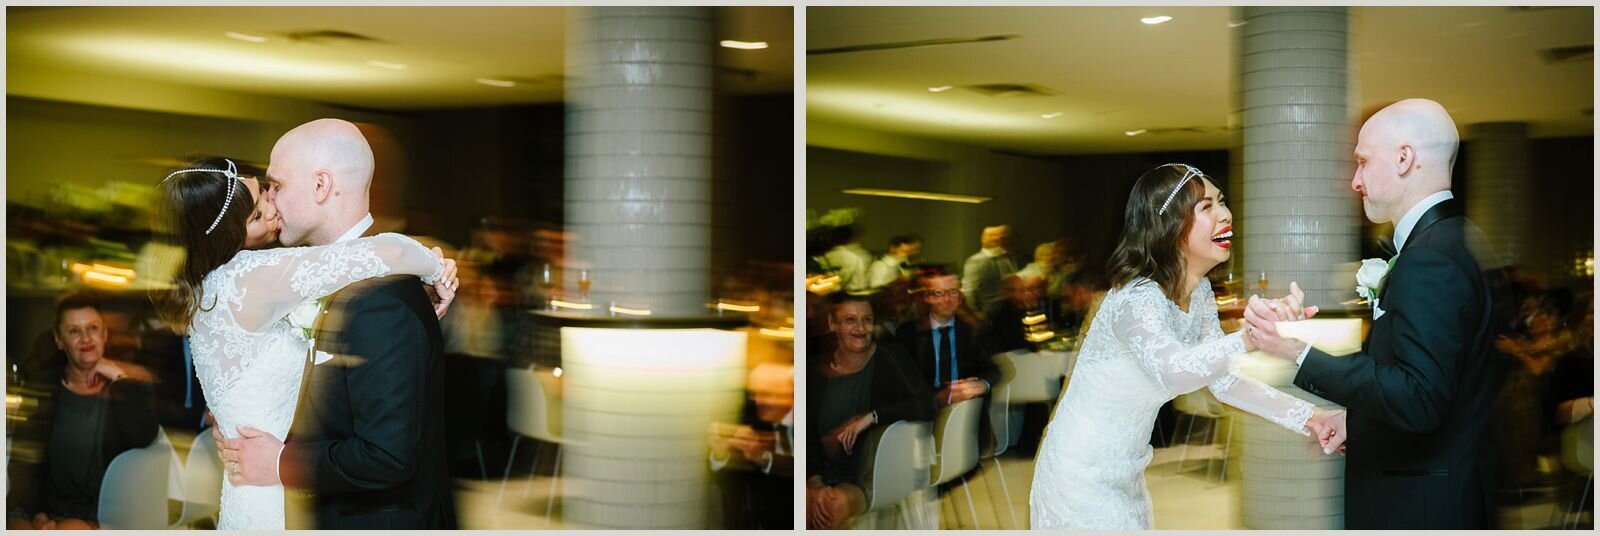 joseph_koprek_wedding_melbourne_the_prince_deck_0078.jpg